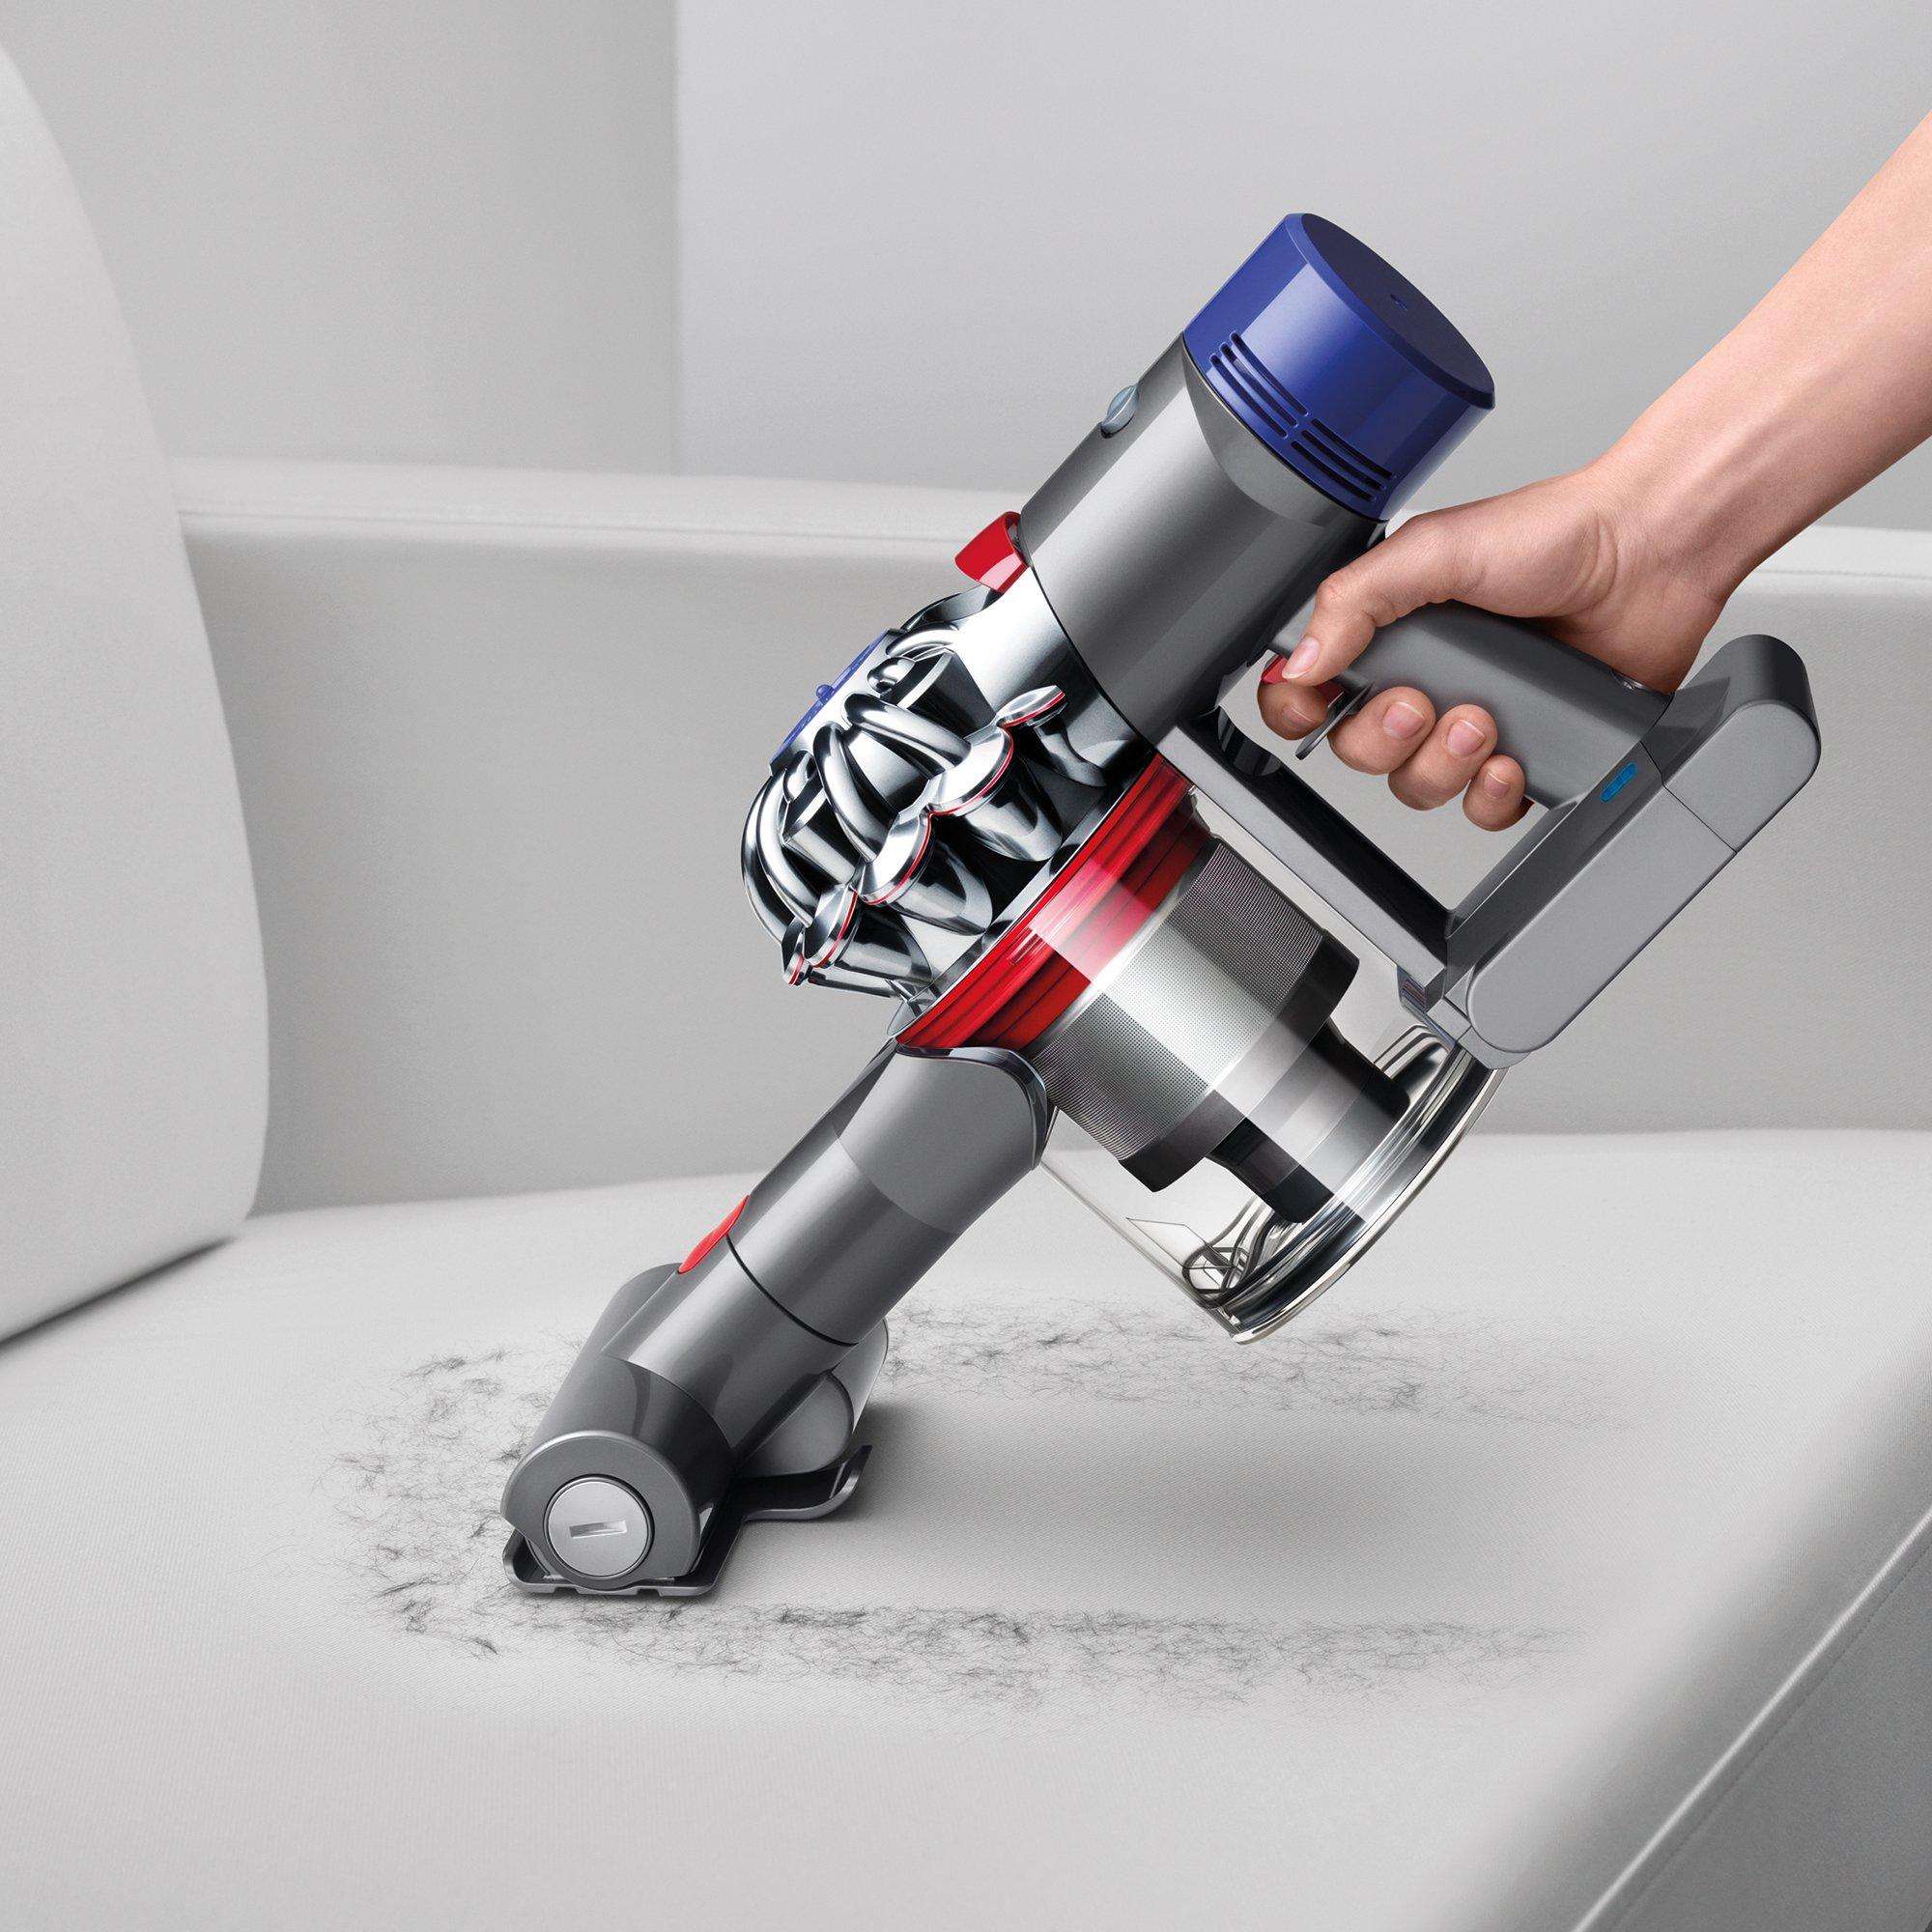 dyson v7 motorhead cordless stick vacuum cleaner bed bugs buster. Black Bedroom Furniture Sets. Home Design Ideas